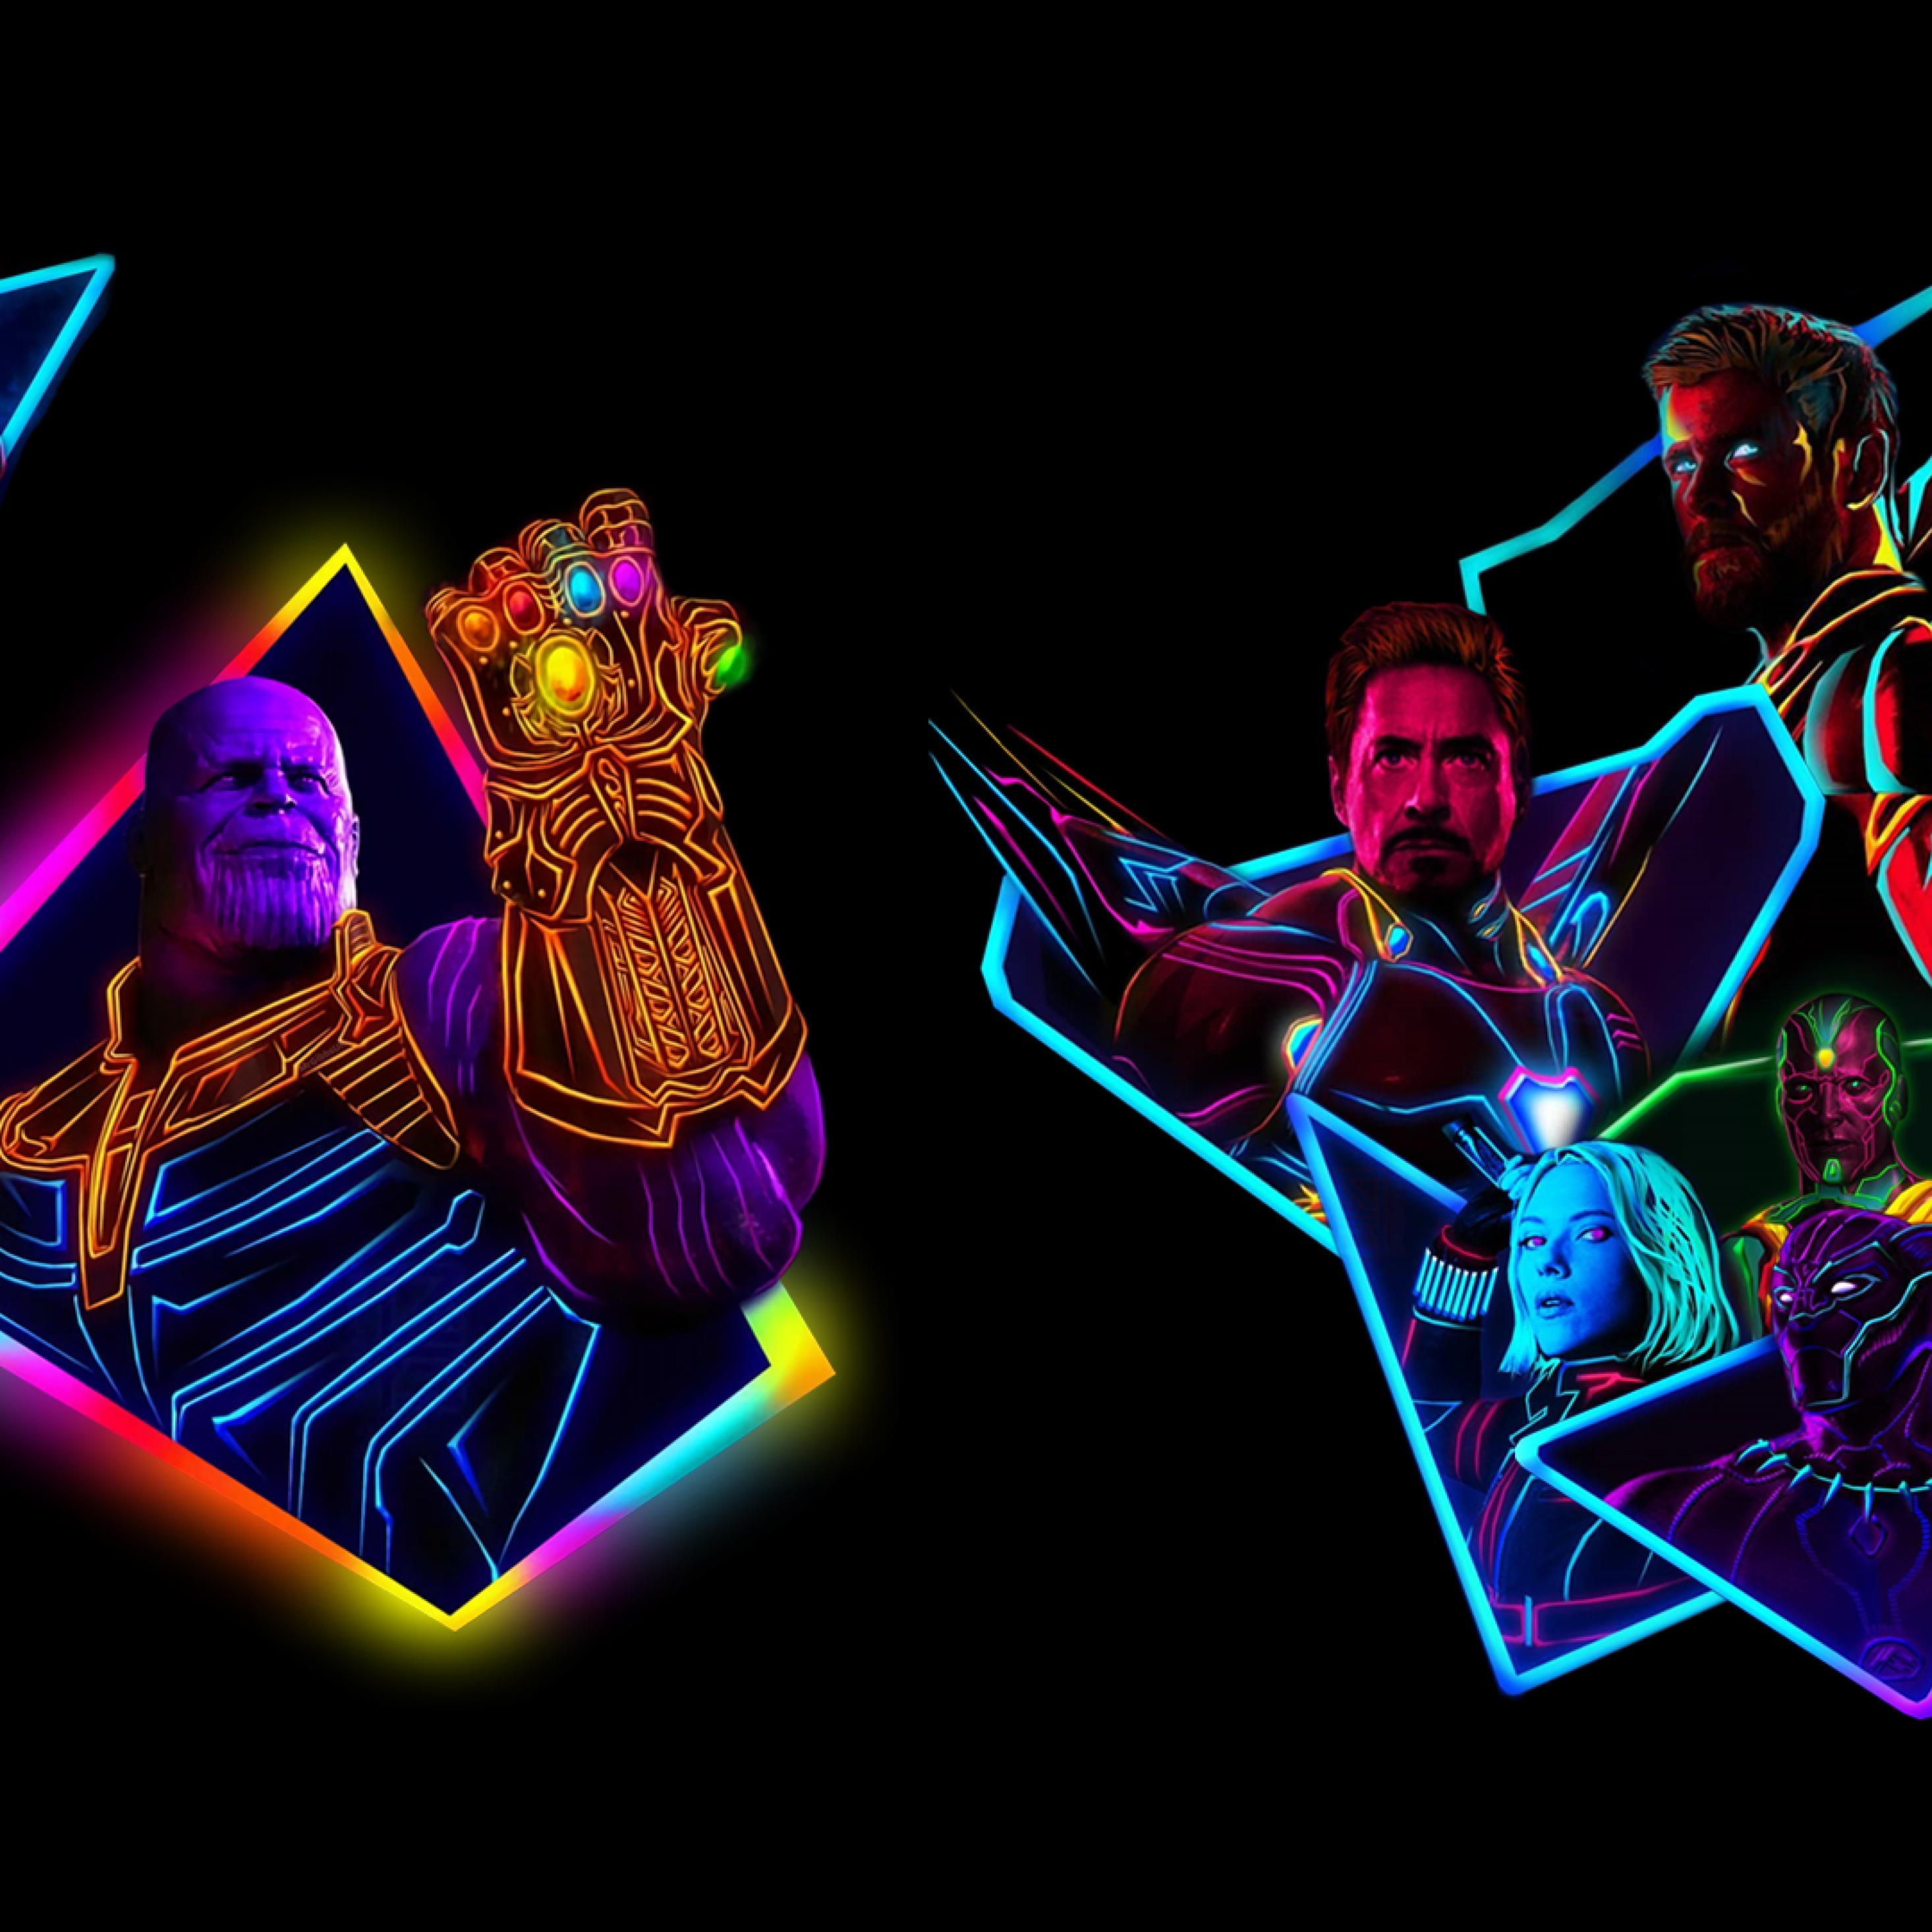 Avengers Infinity War Neon Wallpaper Download 2932x2932 Wallpaper Teahub Io